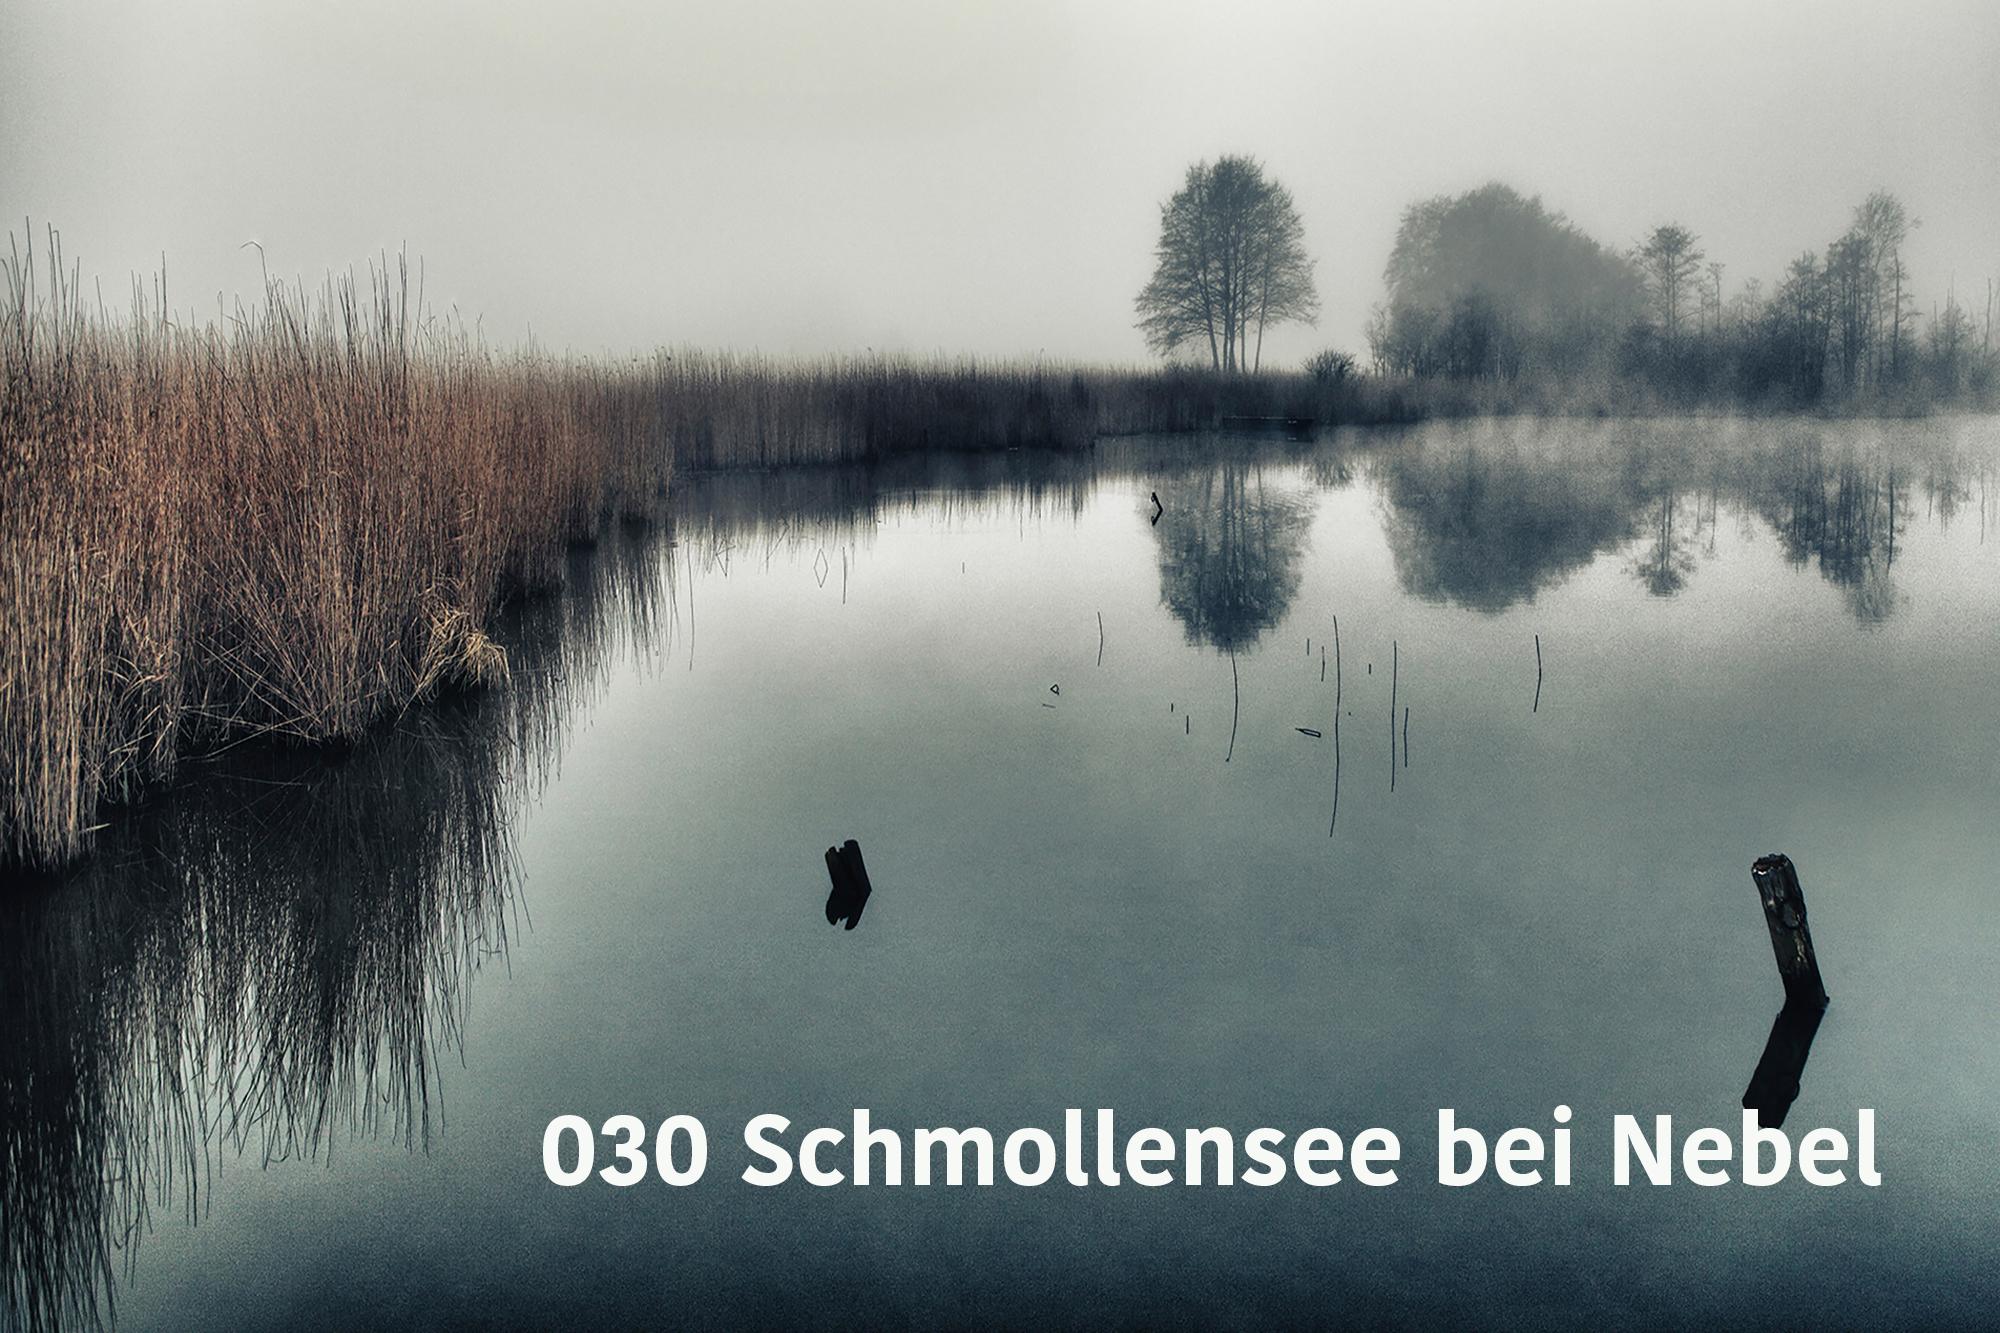 Usedom Motive (2) Canvasleinwanddruck auf Keilrahmen 70 x 100 cm